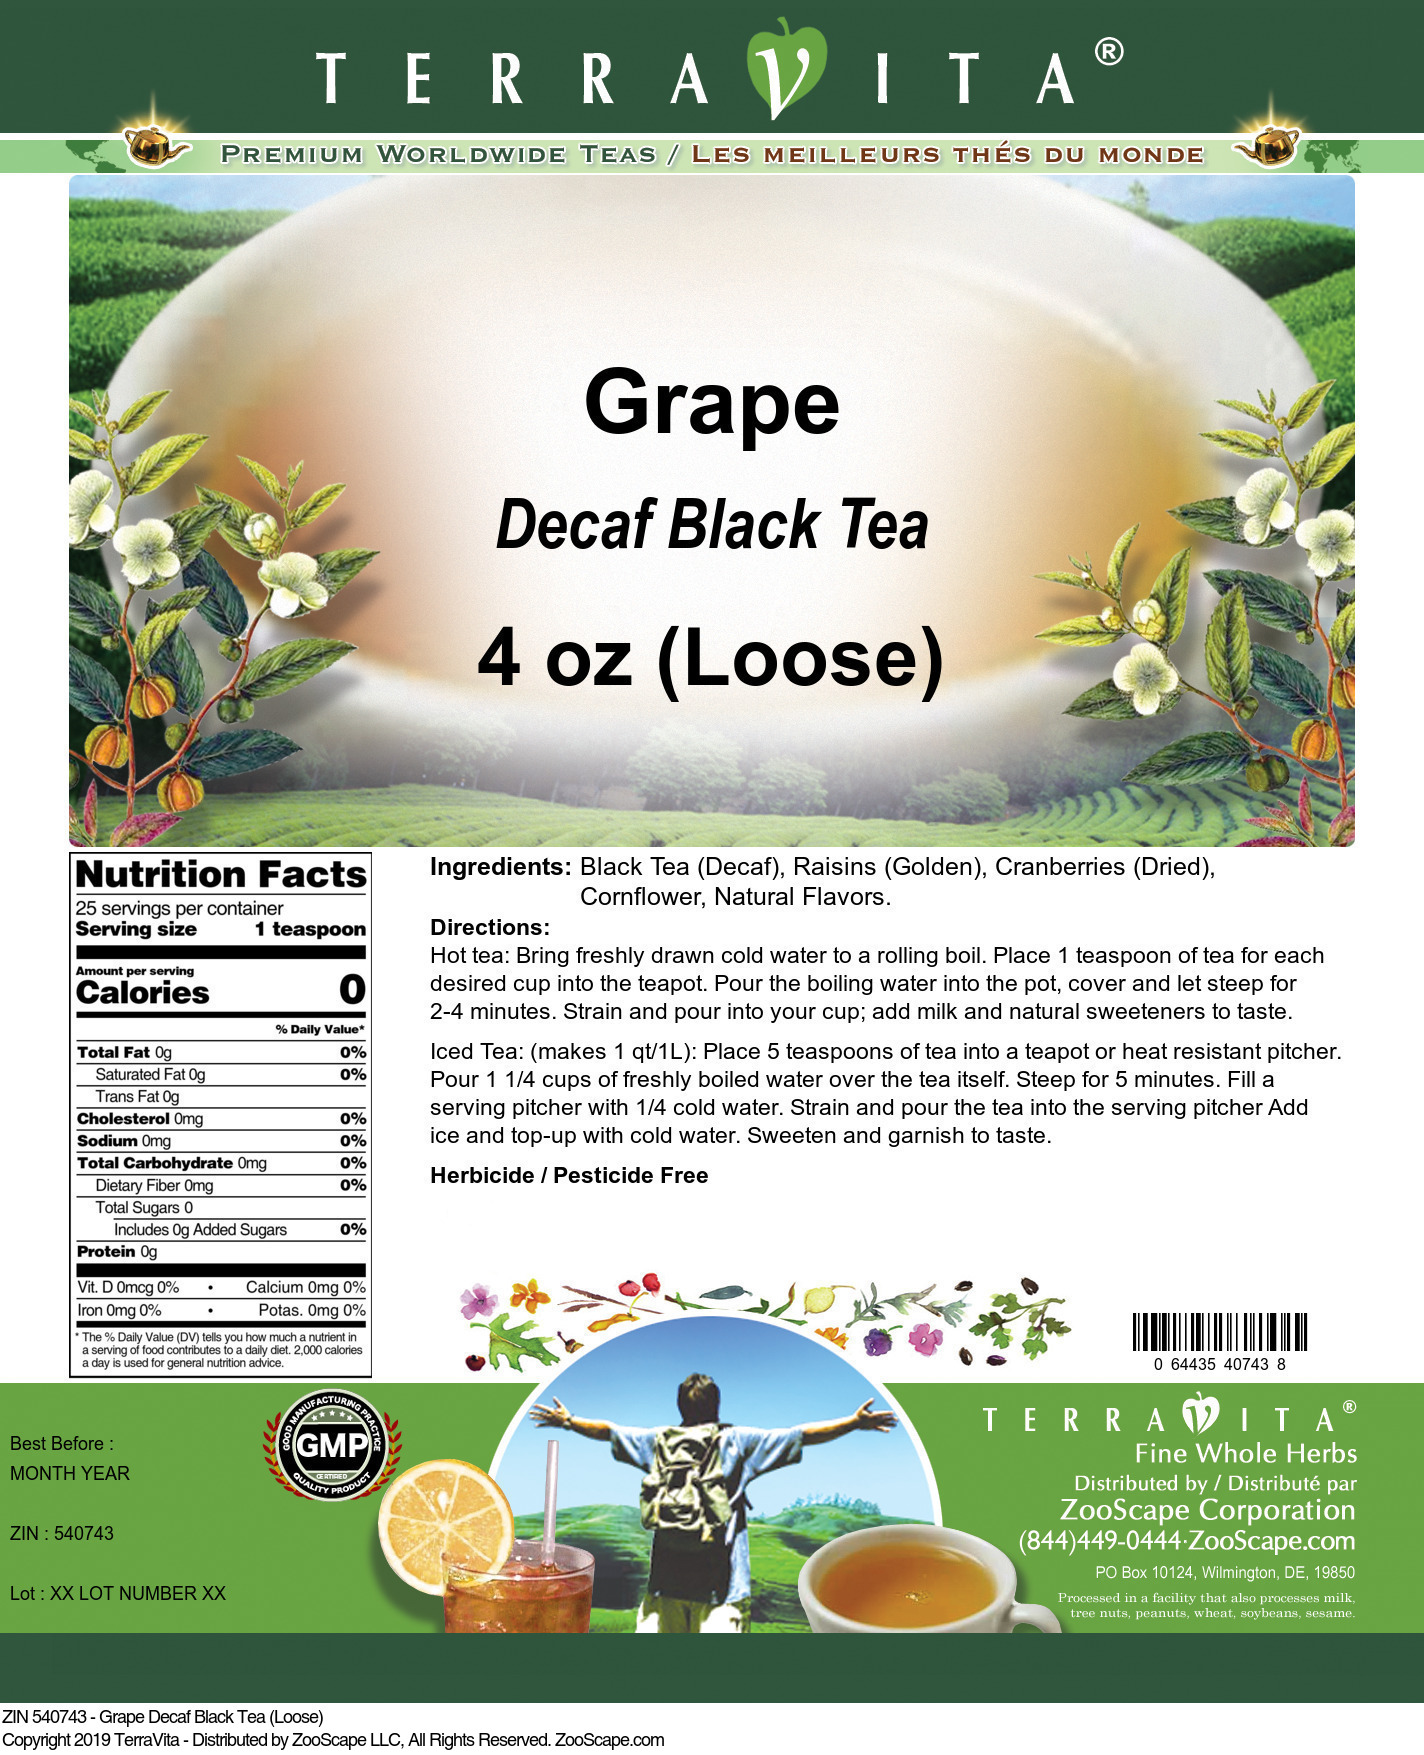 Grape Decaf Black Tea